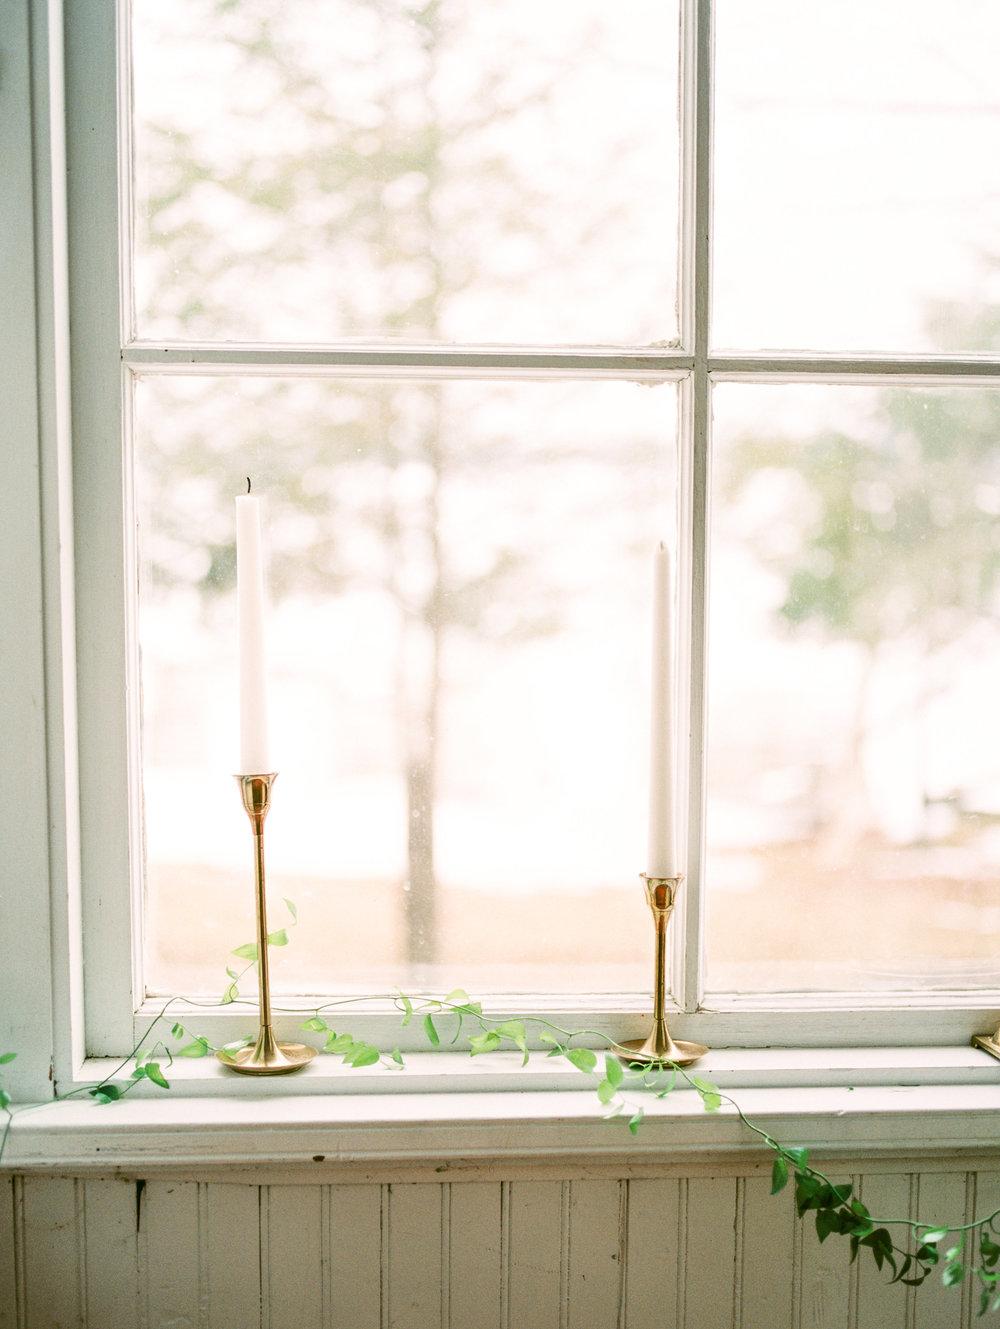 wedding window decor with vines.jpg